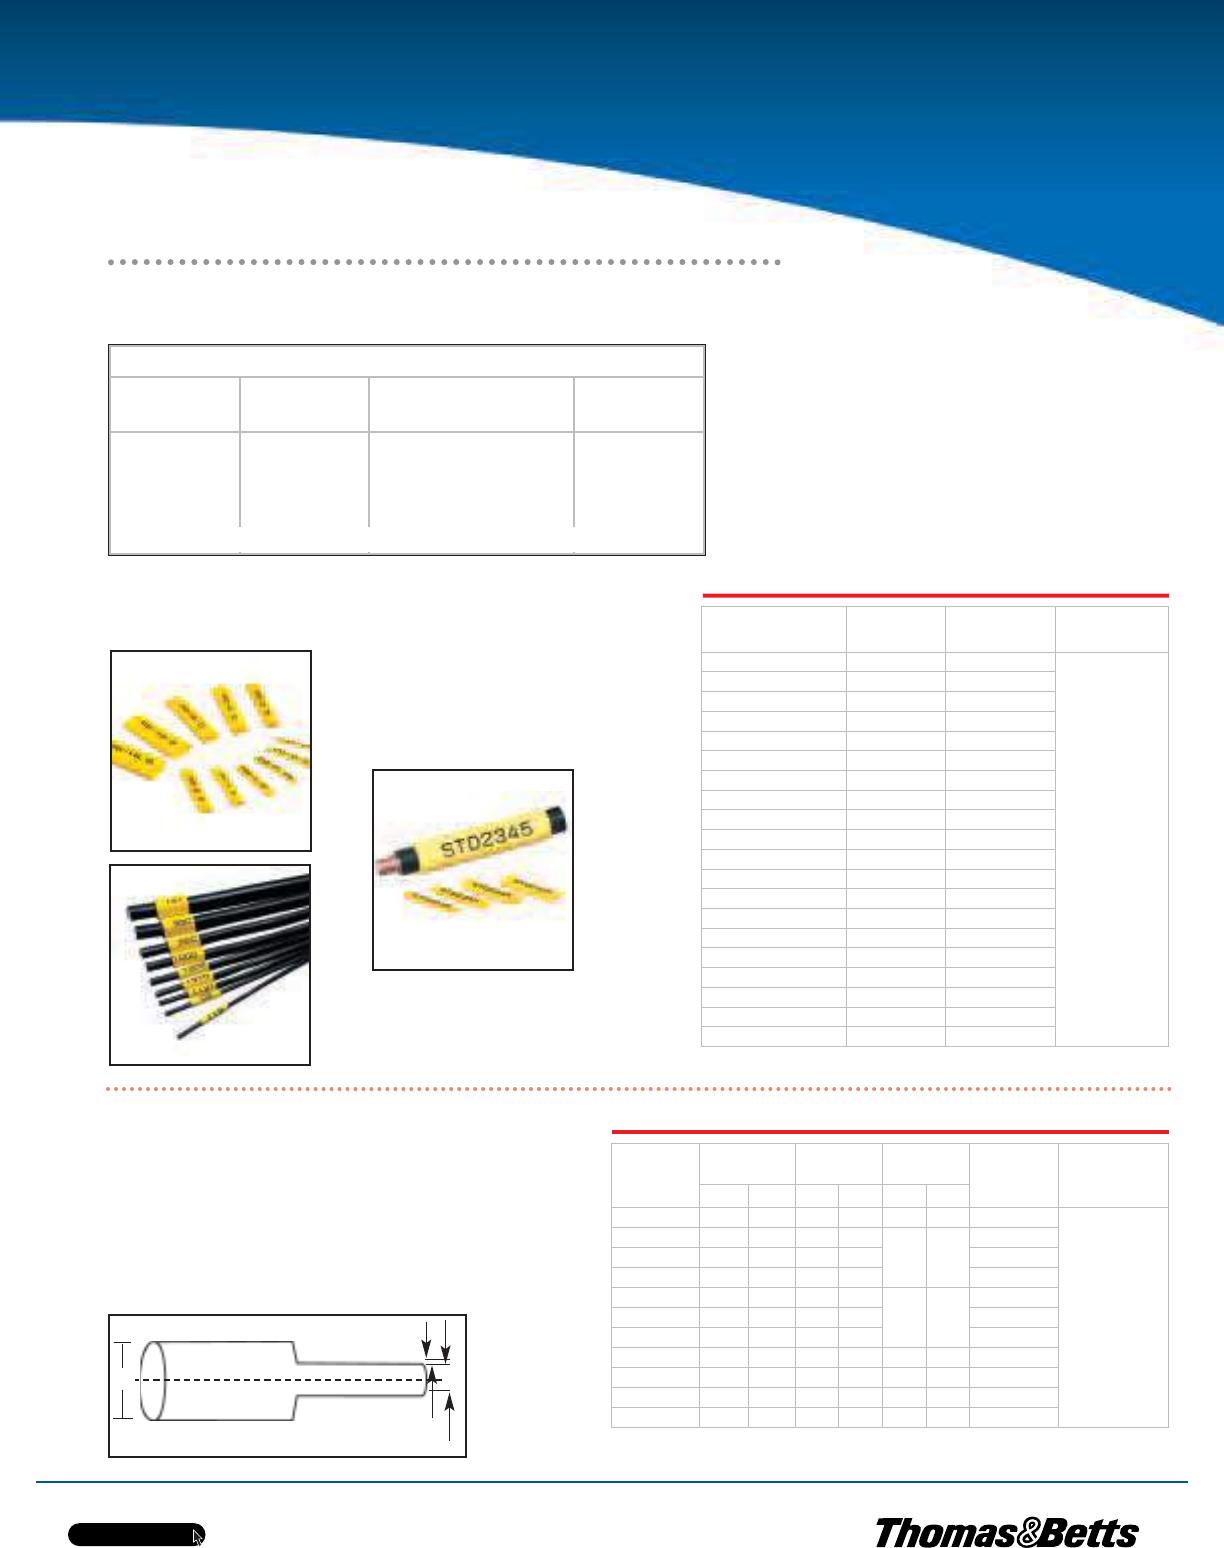 Thomas Betts E Z Code Identification Products 108217 Catalog Tnb 3 Phase Meter Fuse Box Tnbca E27